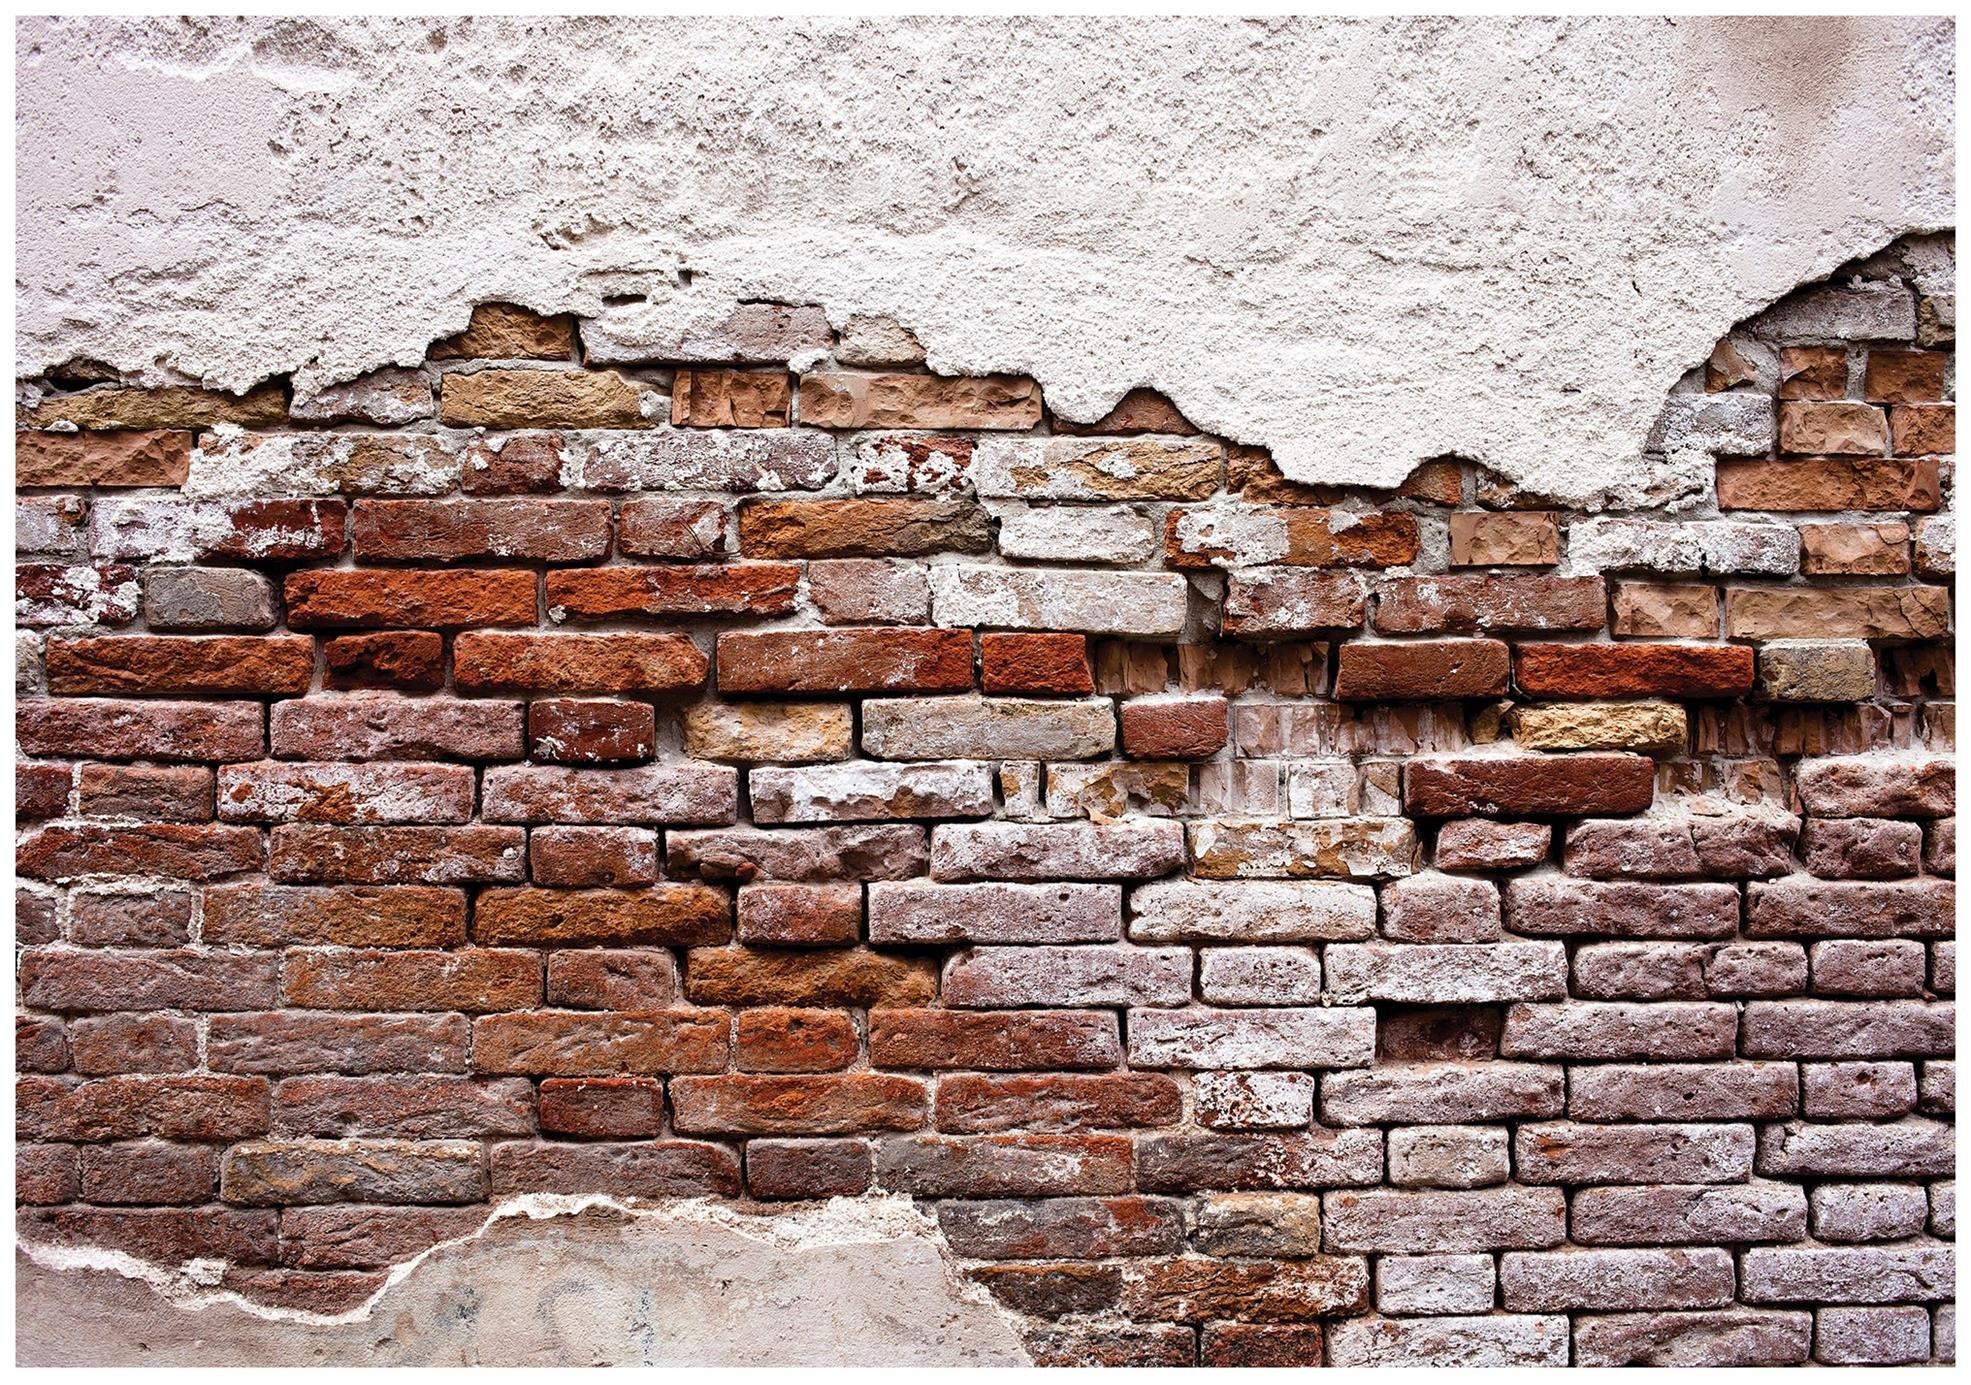 Fototapeta 3D cegła kamień fototapety mur